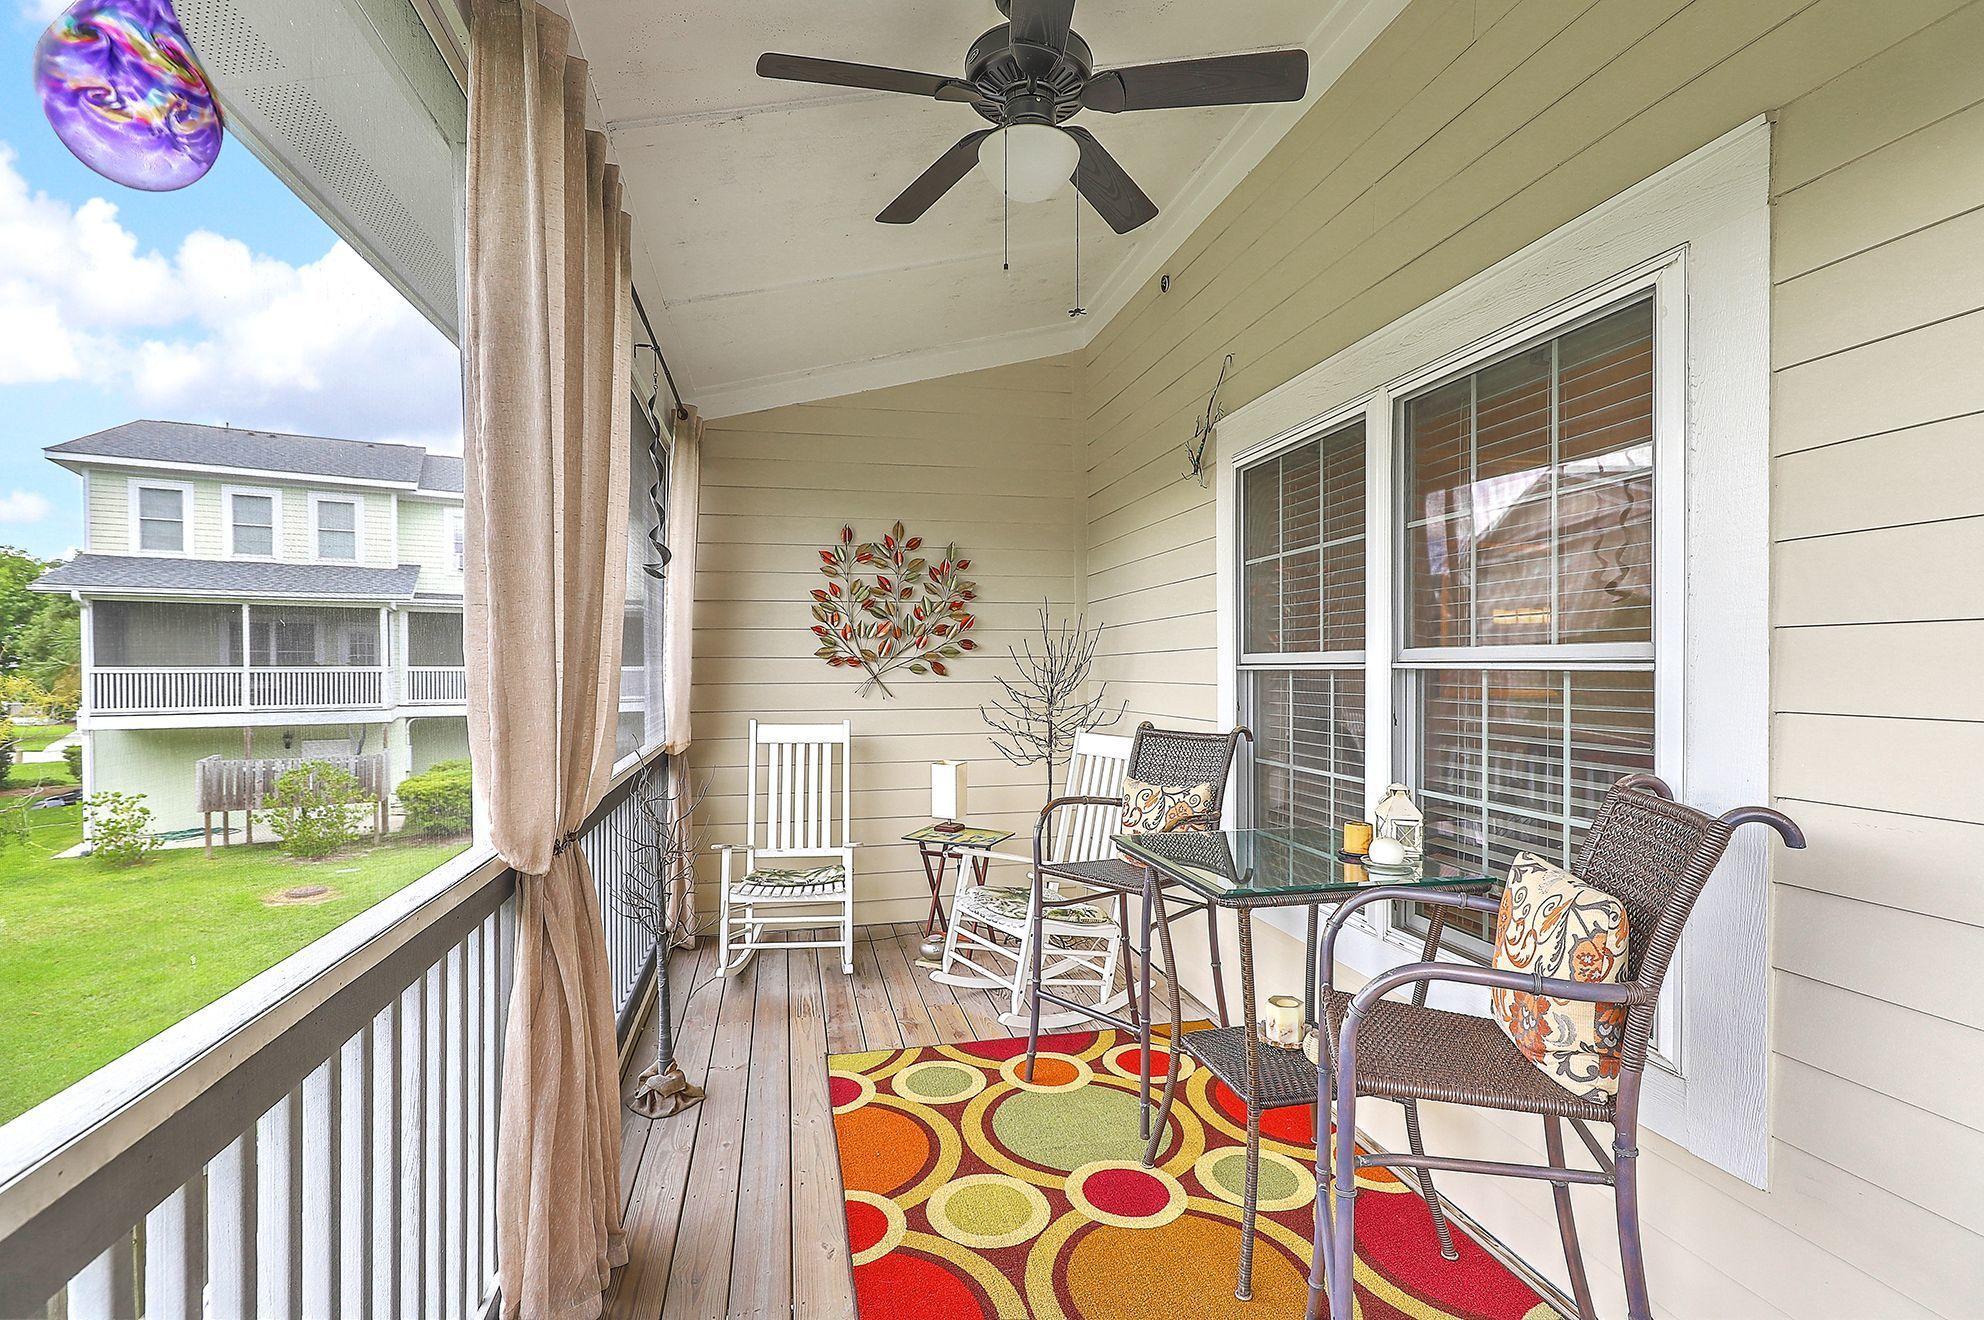 Etiwan Pointe Homes For Sale - 208 Etiwan Pointe, Mount Pleasant, SC - 36